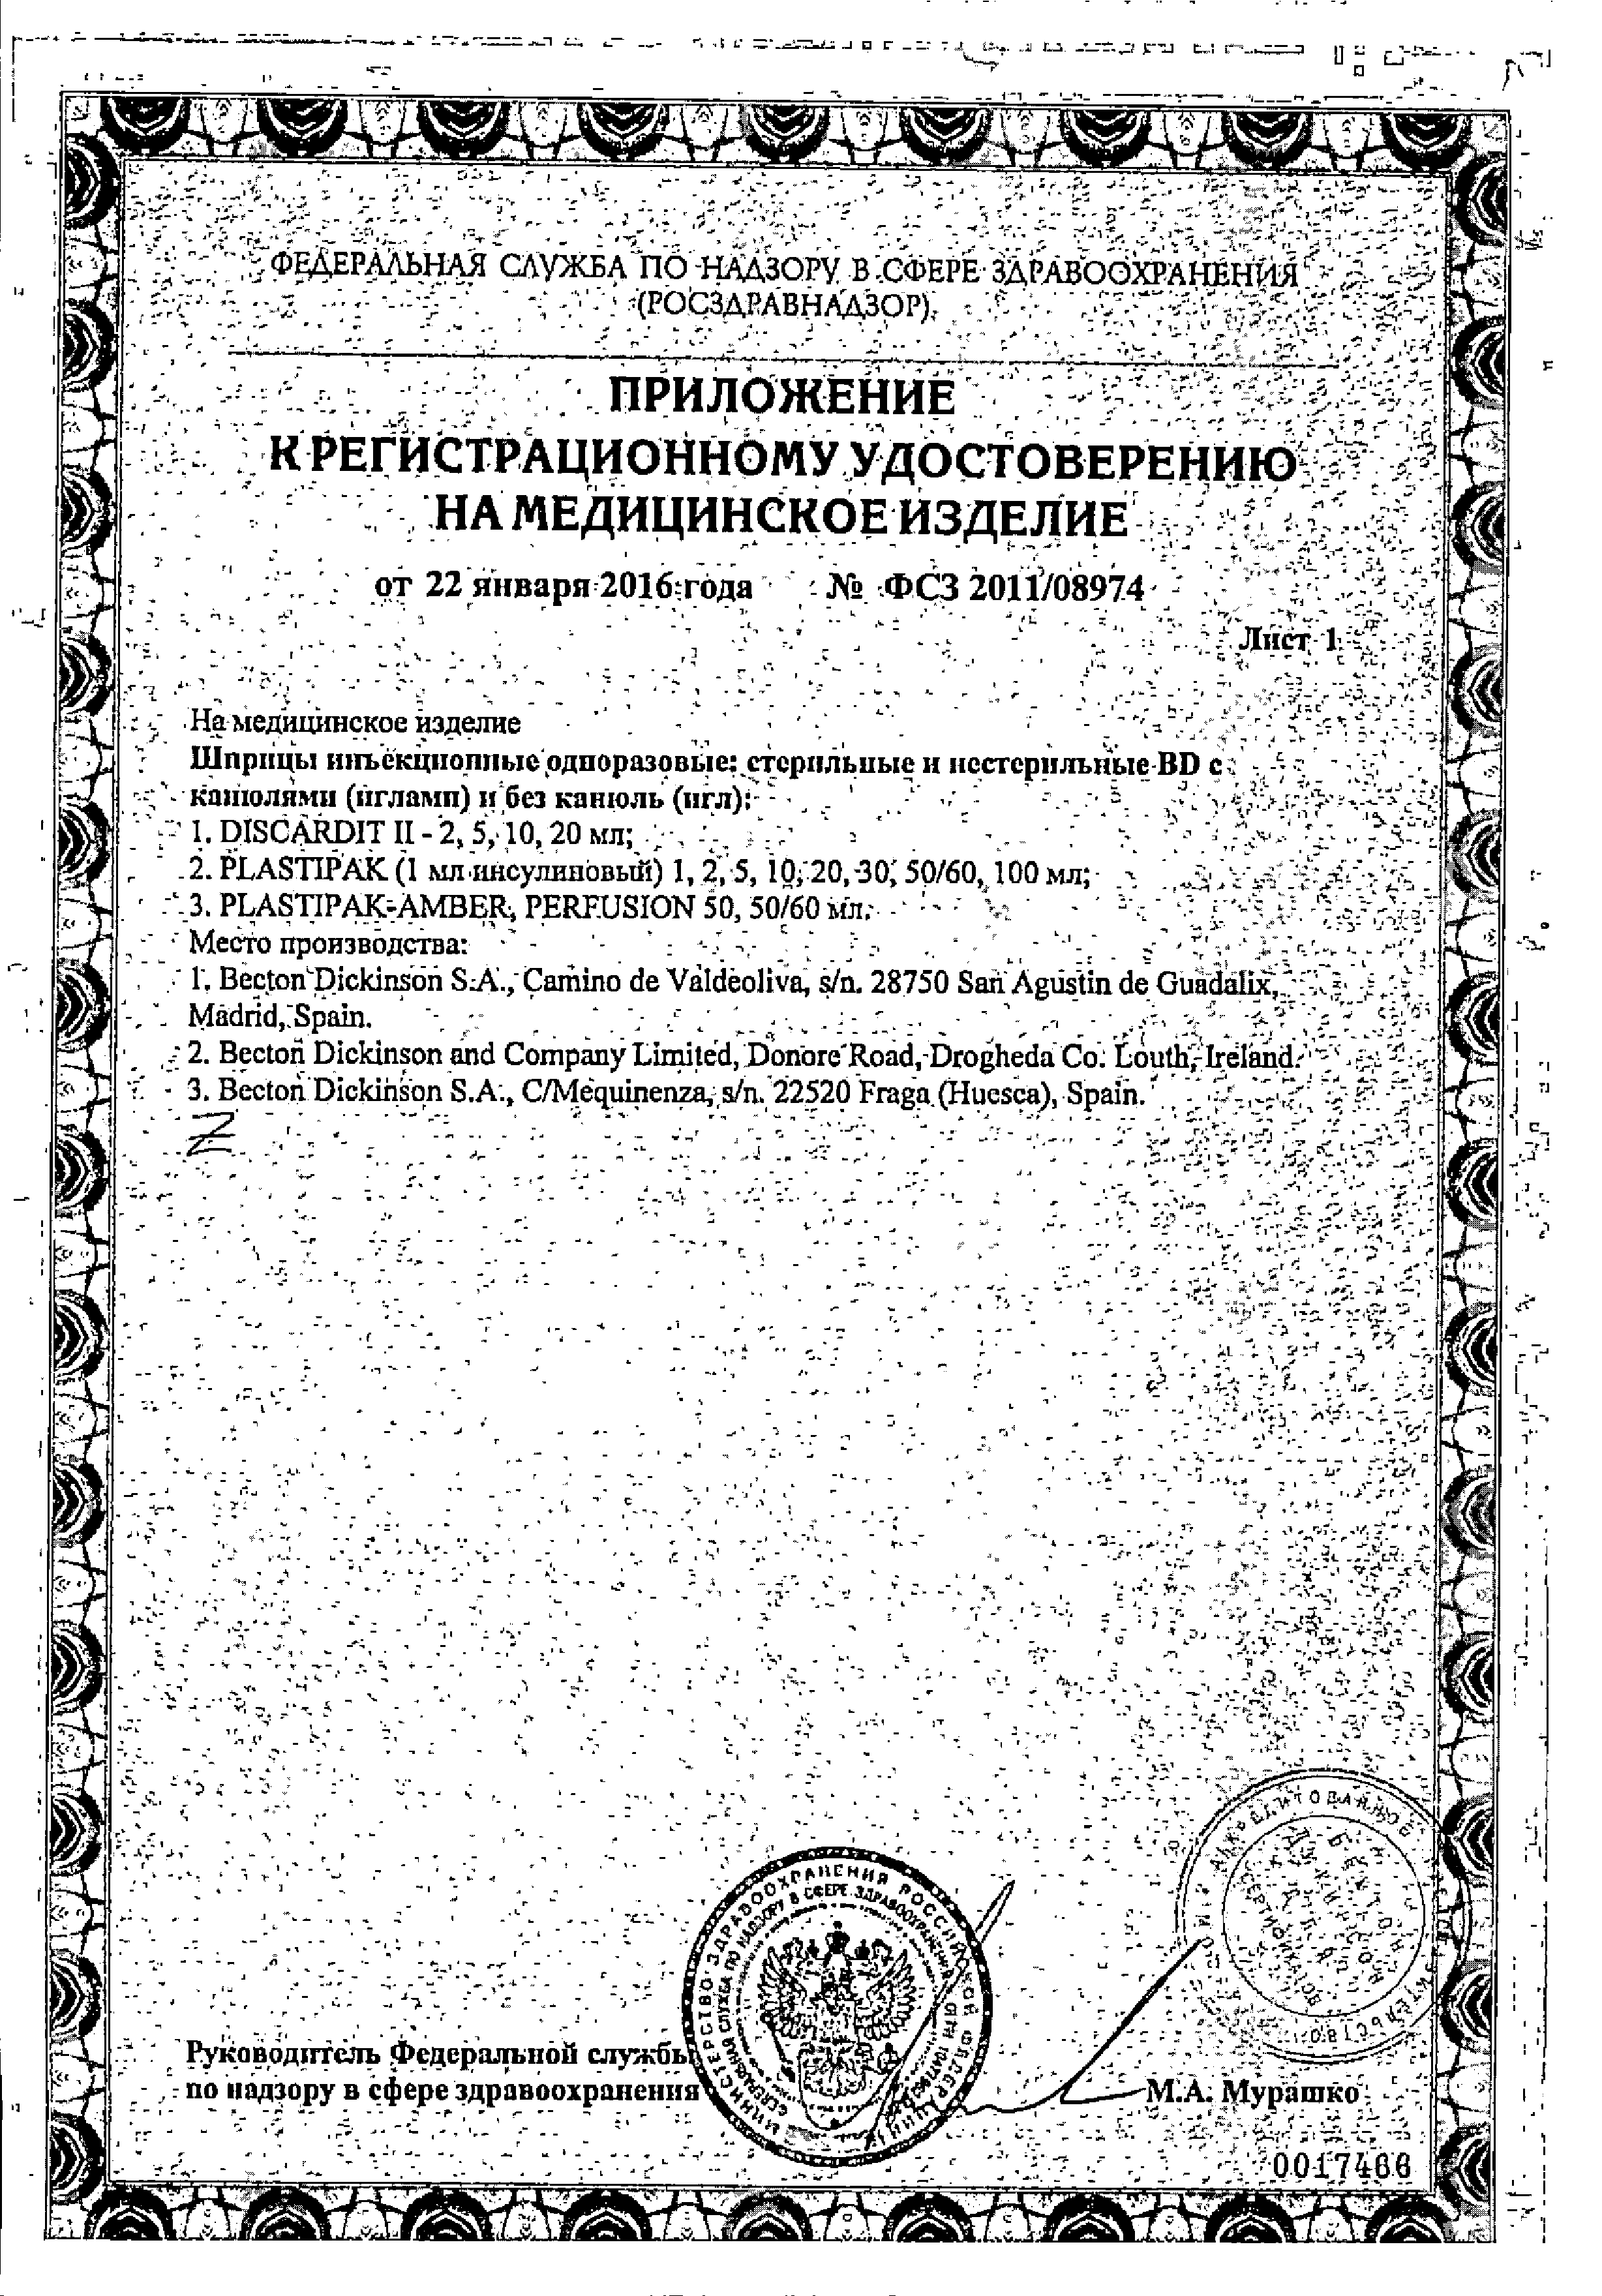 Шприц BD DISCARDIT II 5мл сертификат